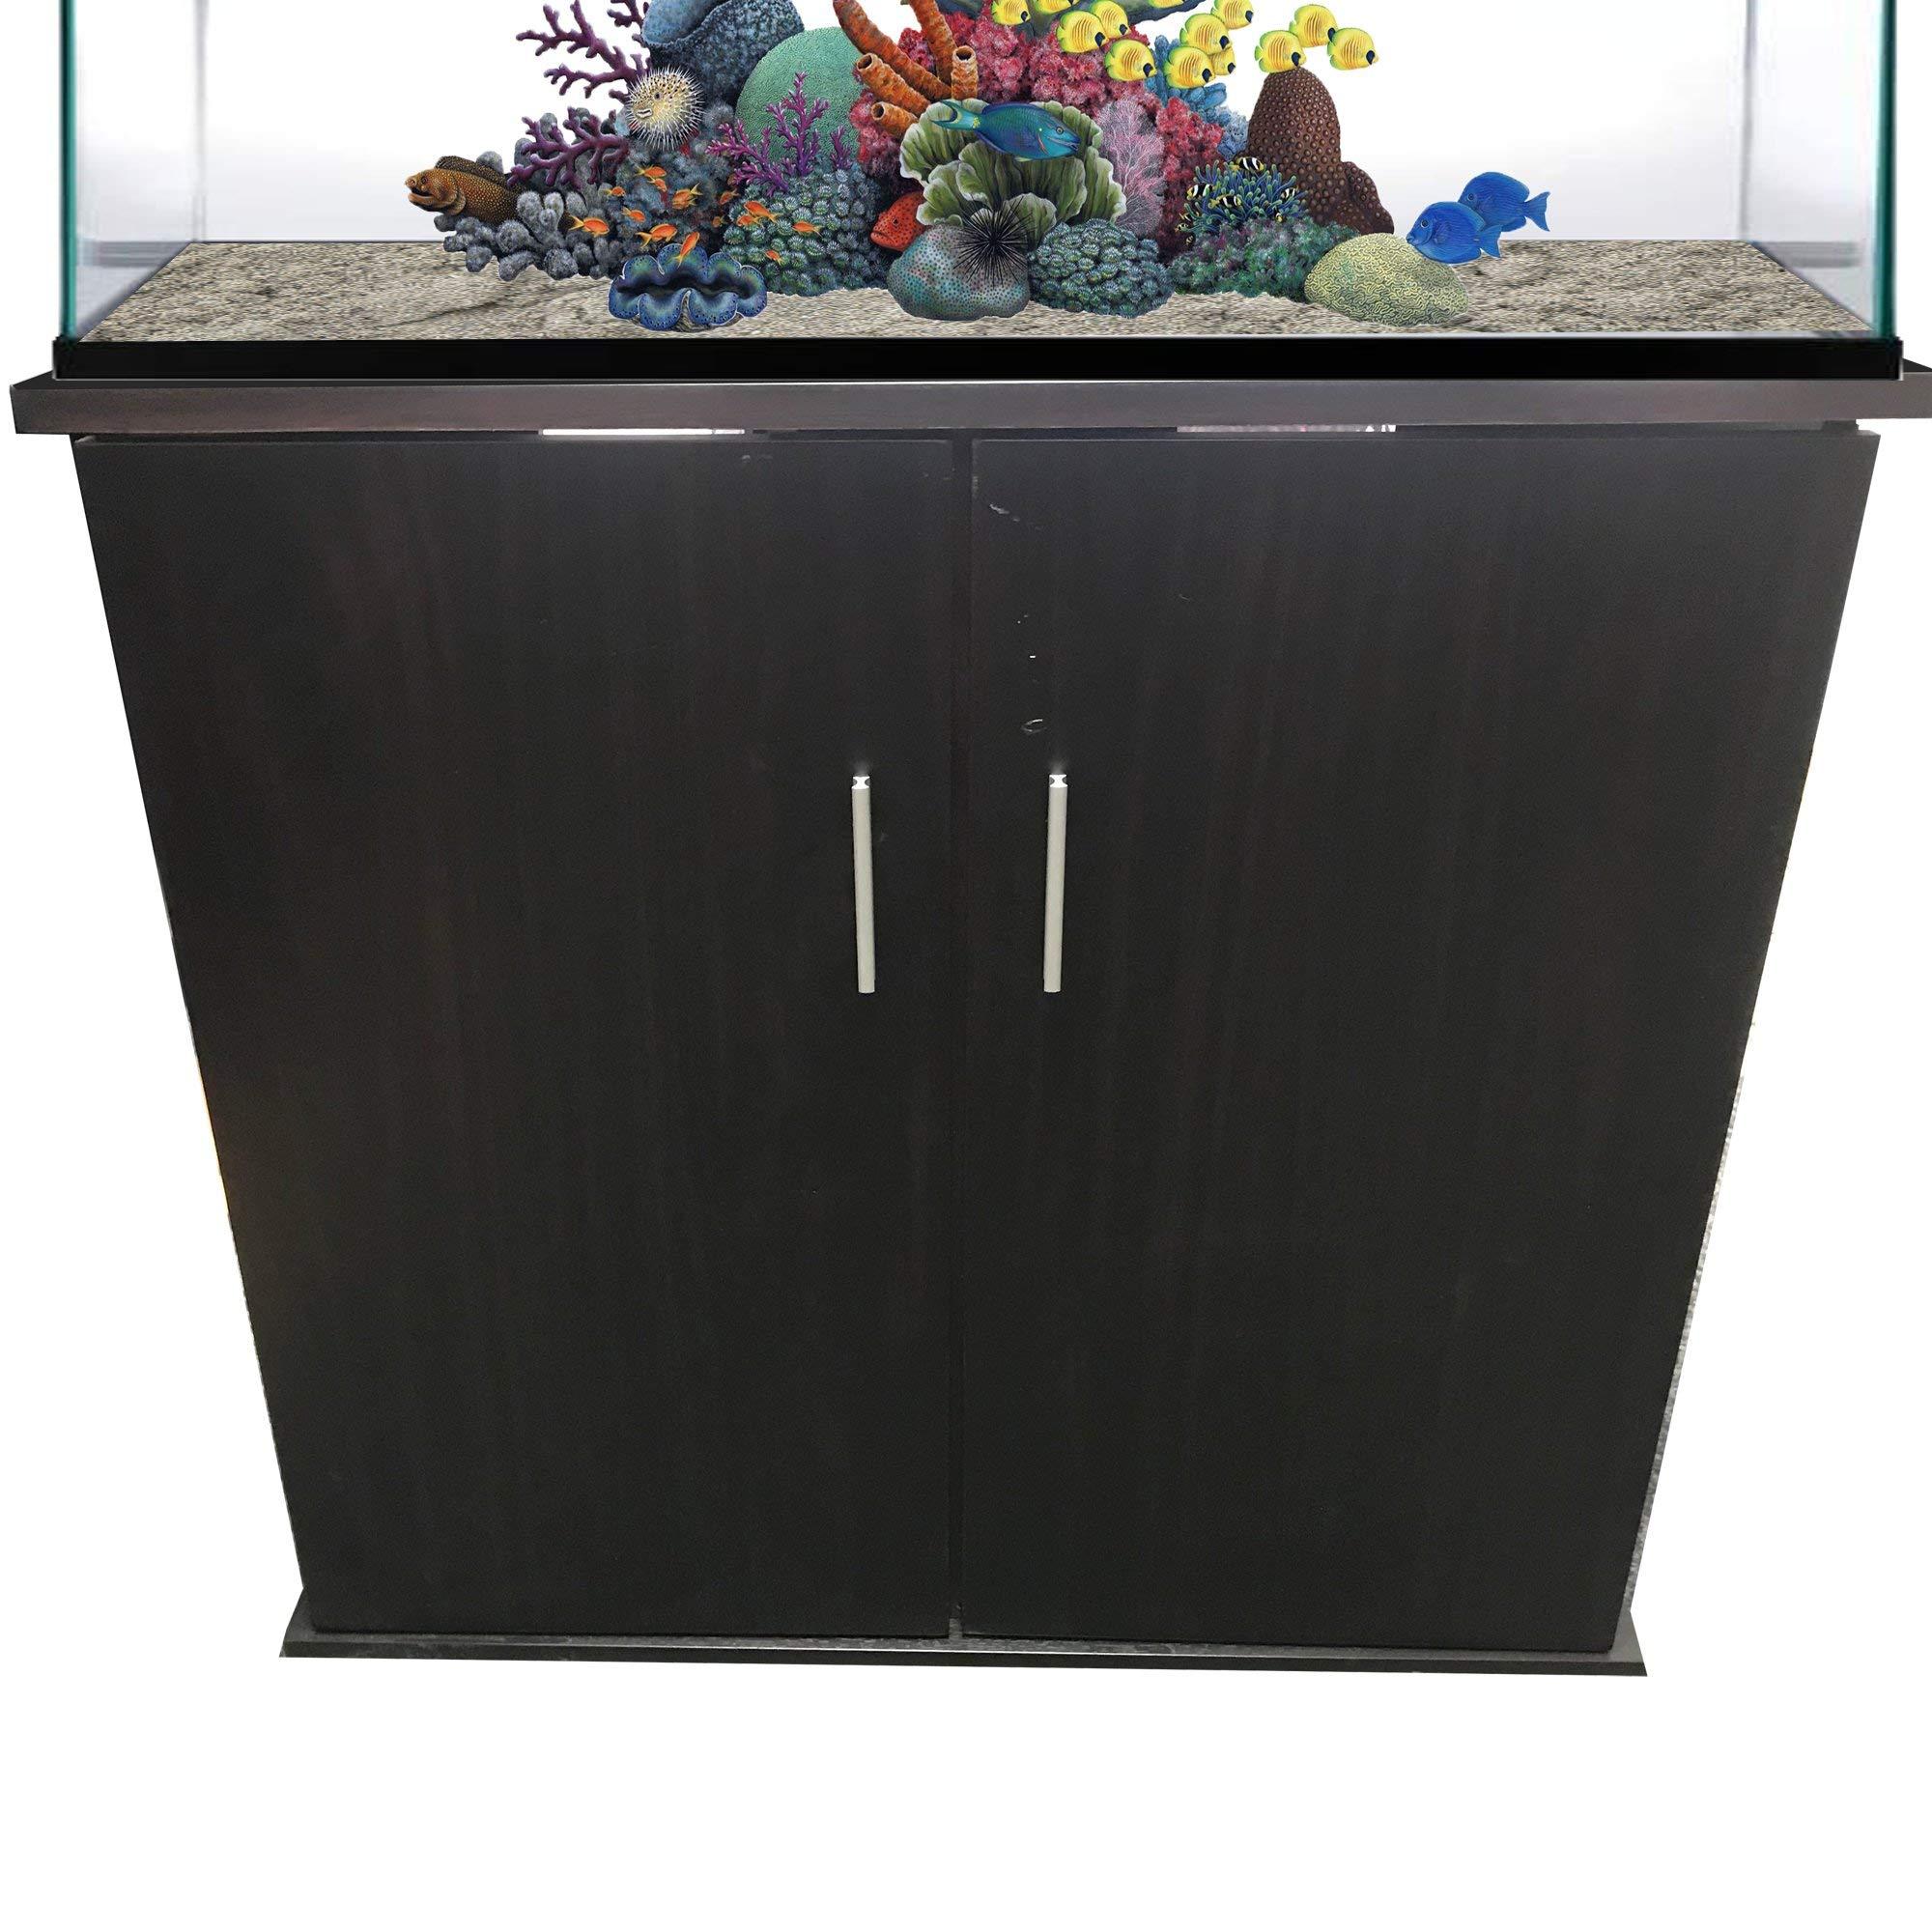 R&J Enterprises 36x12 Espresso Modern Aquarium Cabinet, 55 LBS by R&J Enterprises